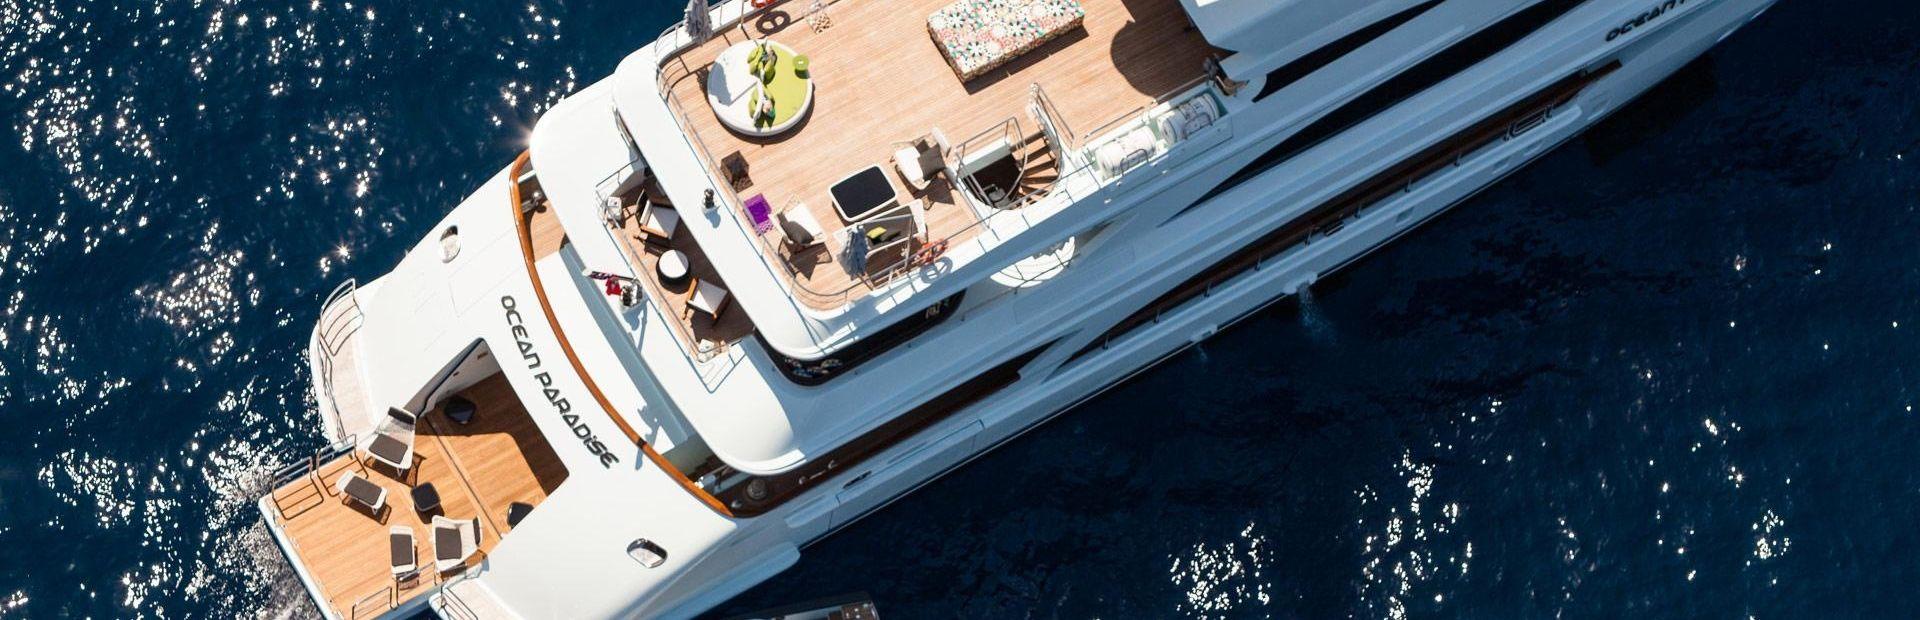 Charter guests enjoying the beachclub on board Benetti Yacht